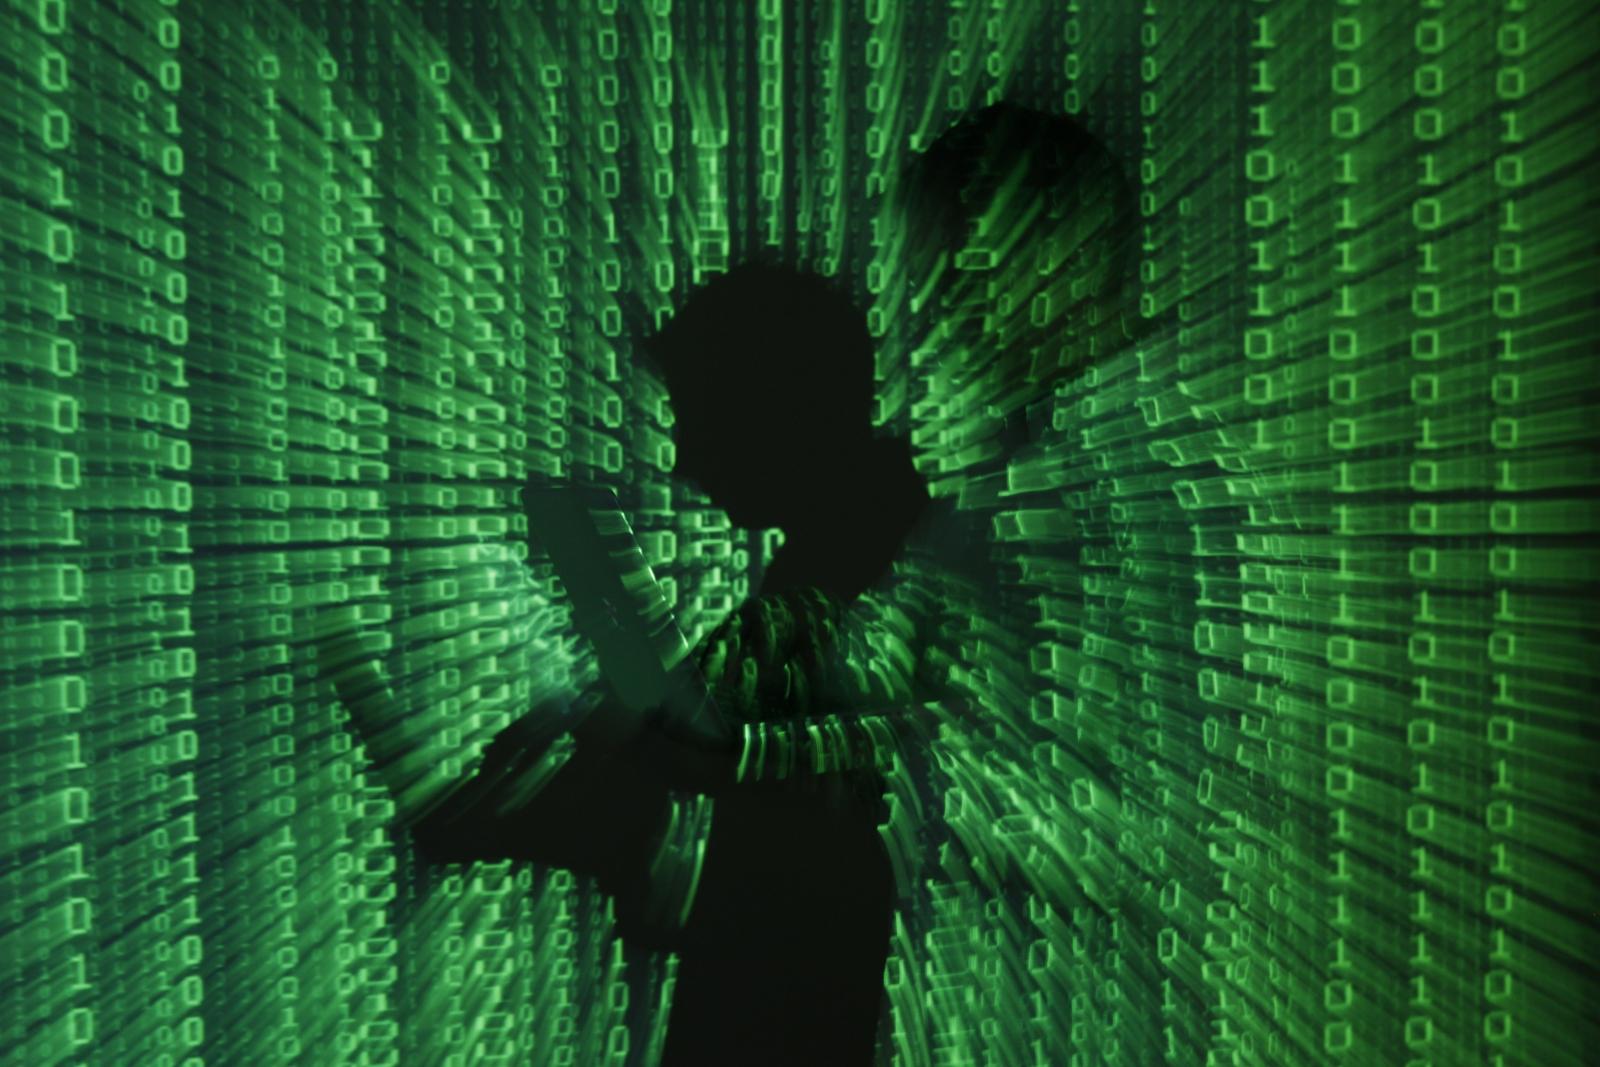 Baijiu malware preys on heightened interest in North Korea